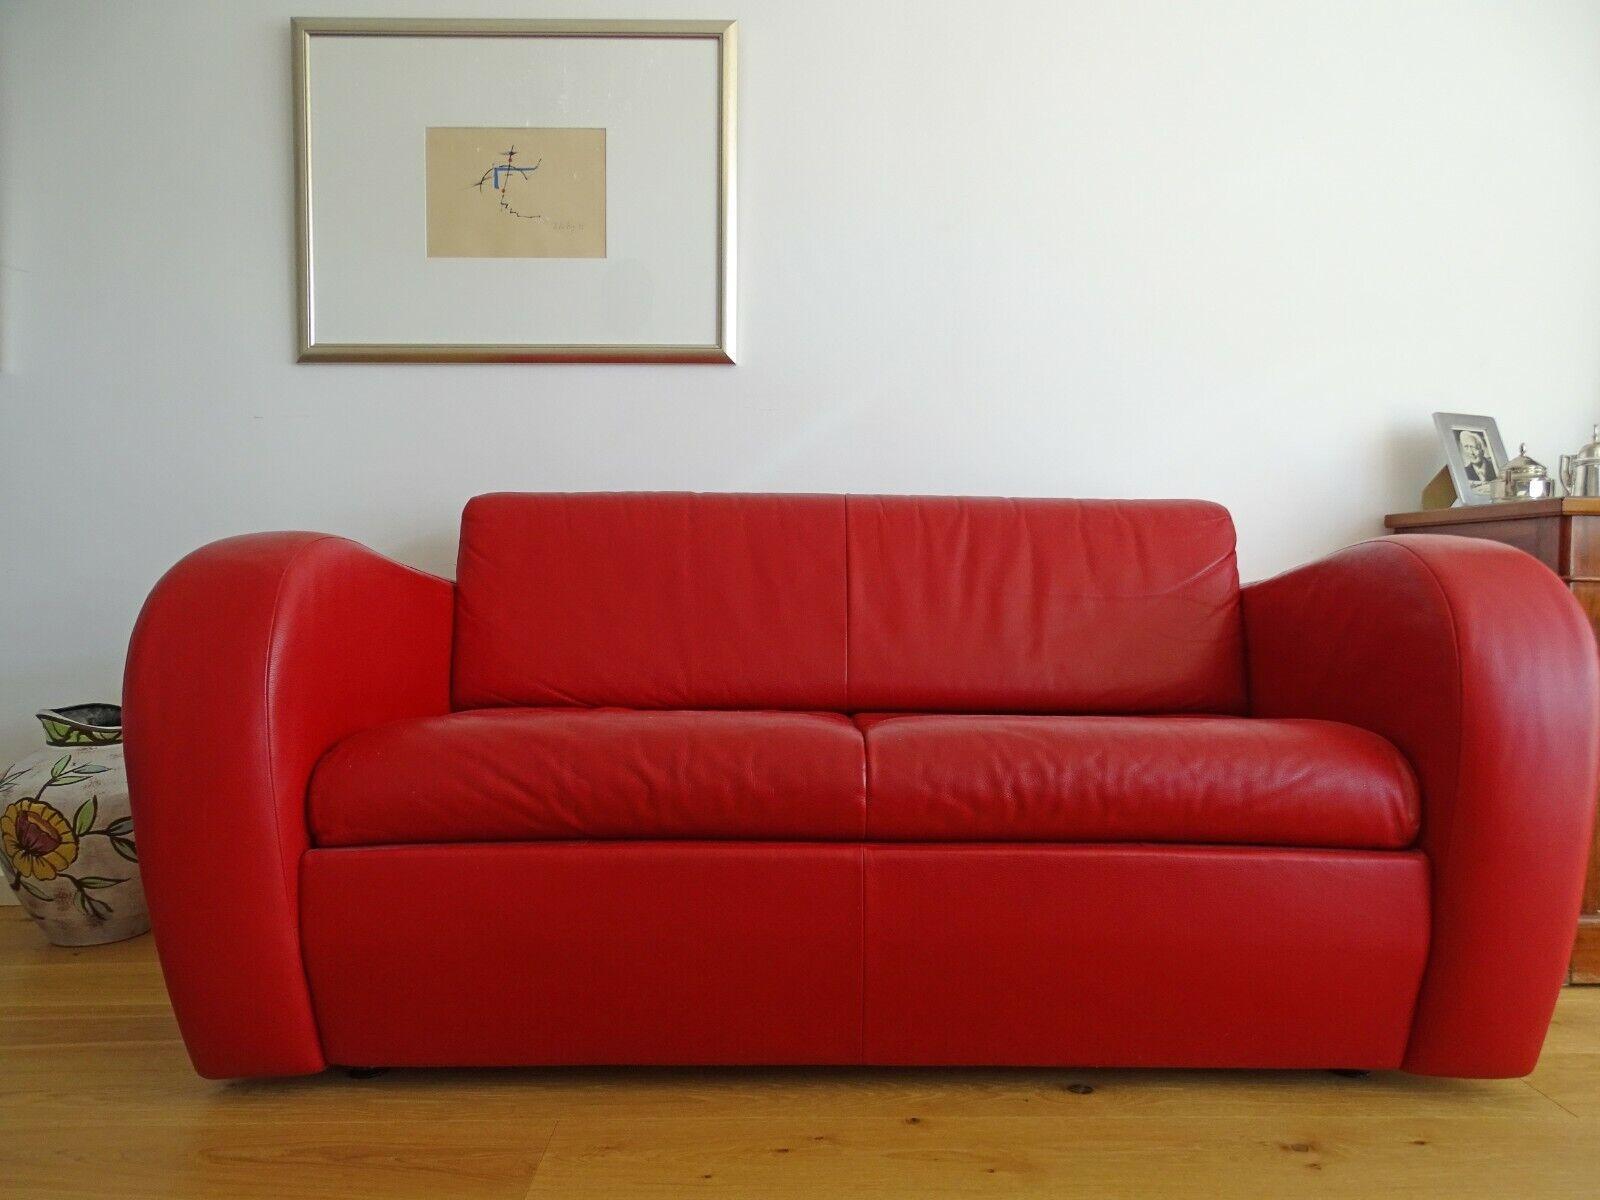 Rotes Schlafsofa 2 sitzer aus Leder